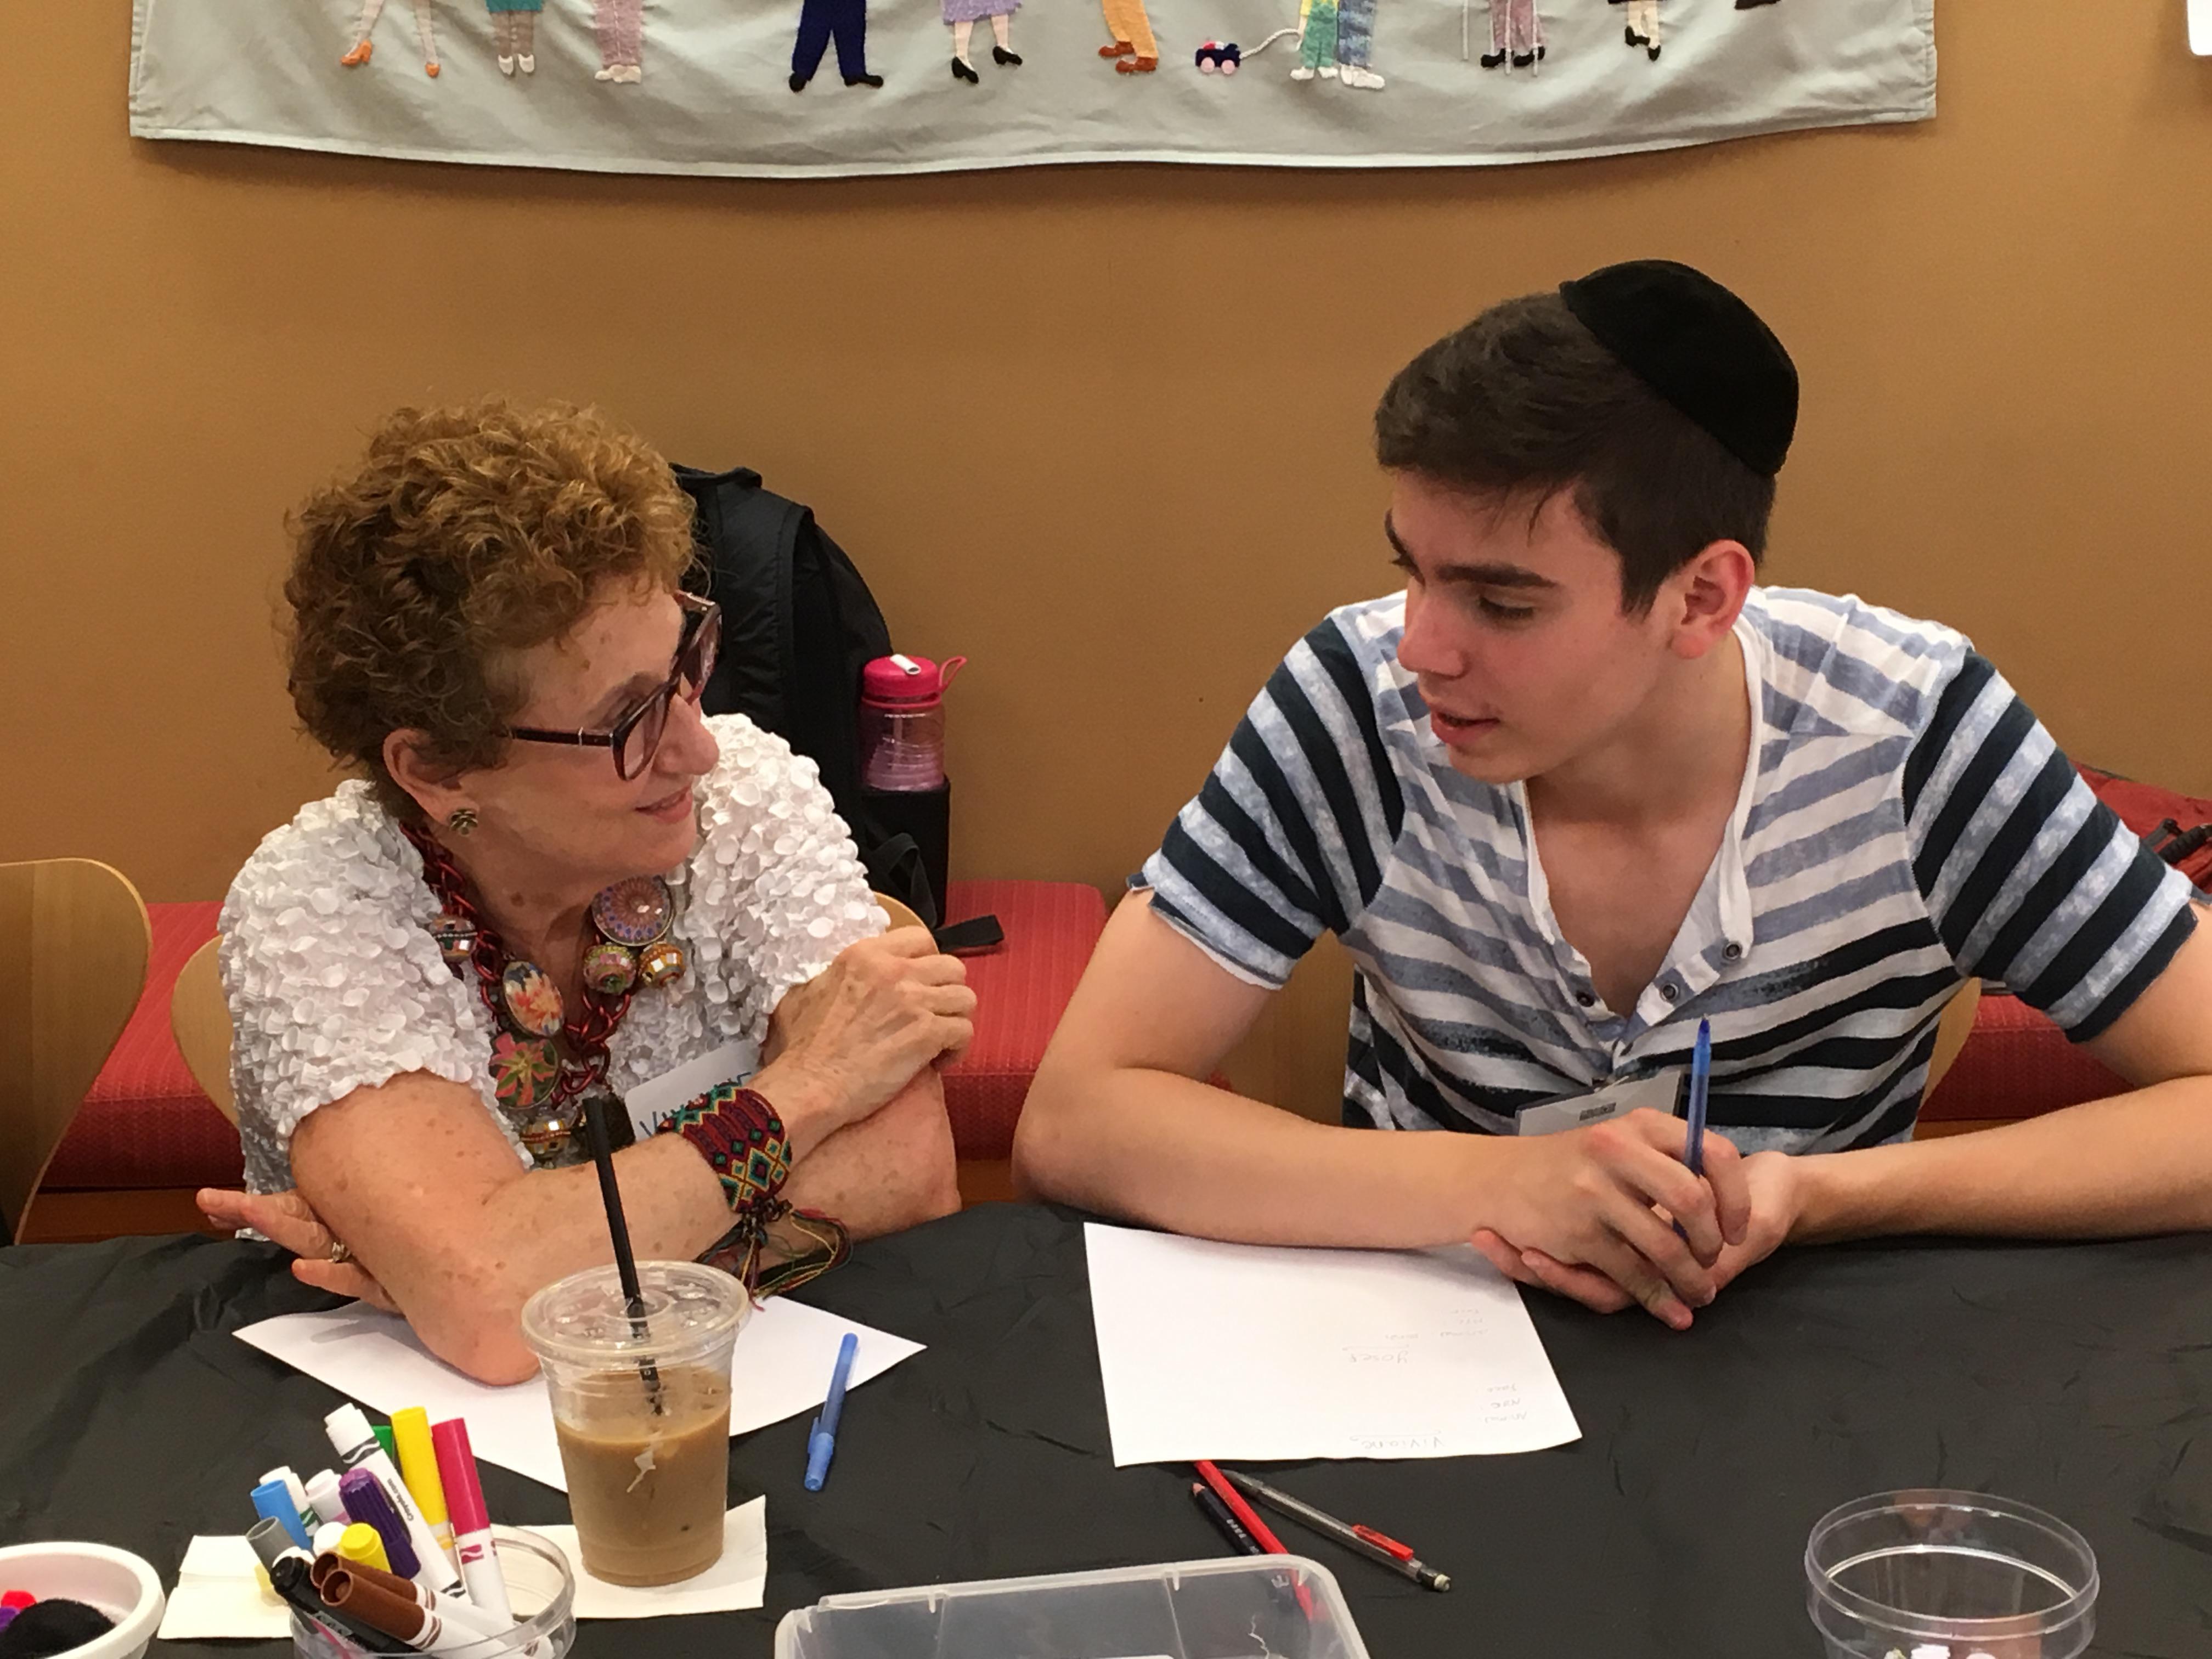 Summer Program - Health and Well Being | DOROT Summer Teen Internship Program - Manhattan